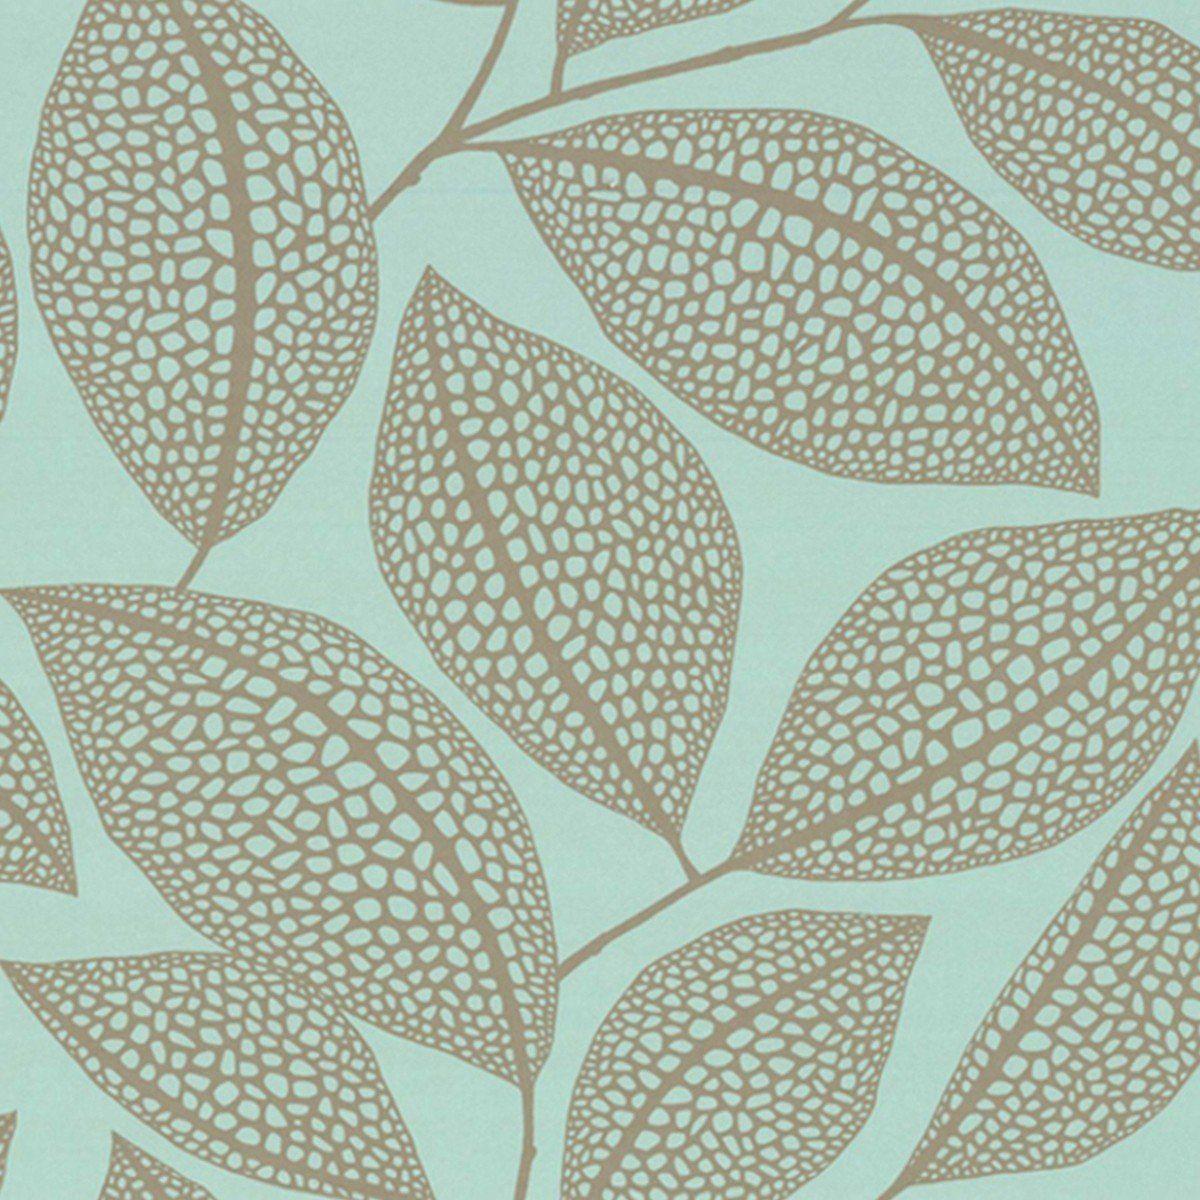 Tapete Pebble Leaf Col 02 Die Tapetenagentur Aus Den Kollektionen Florale Muster Moderne Muster Florale Mus Tapeten Floral Muster Graphische Muster